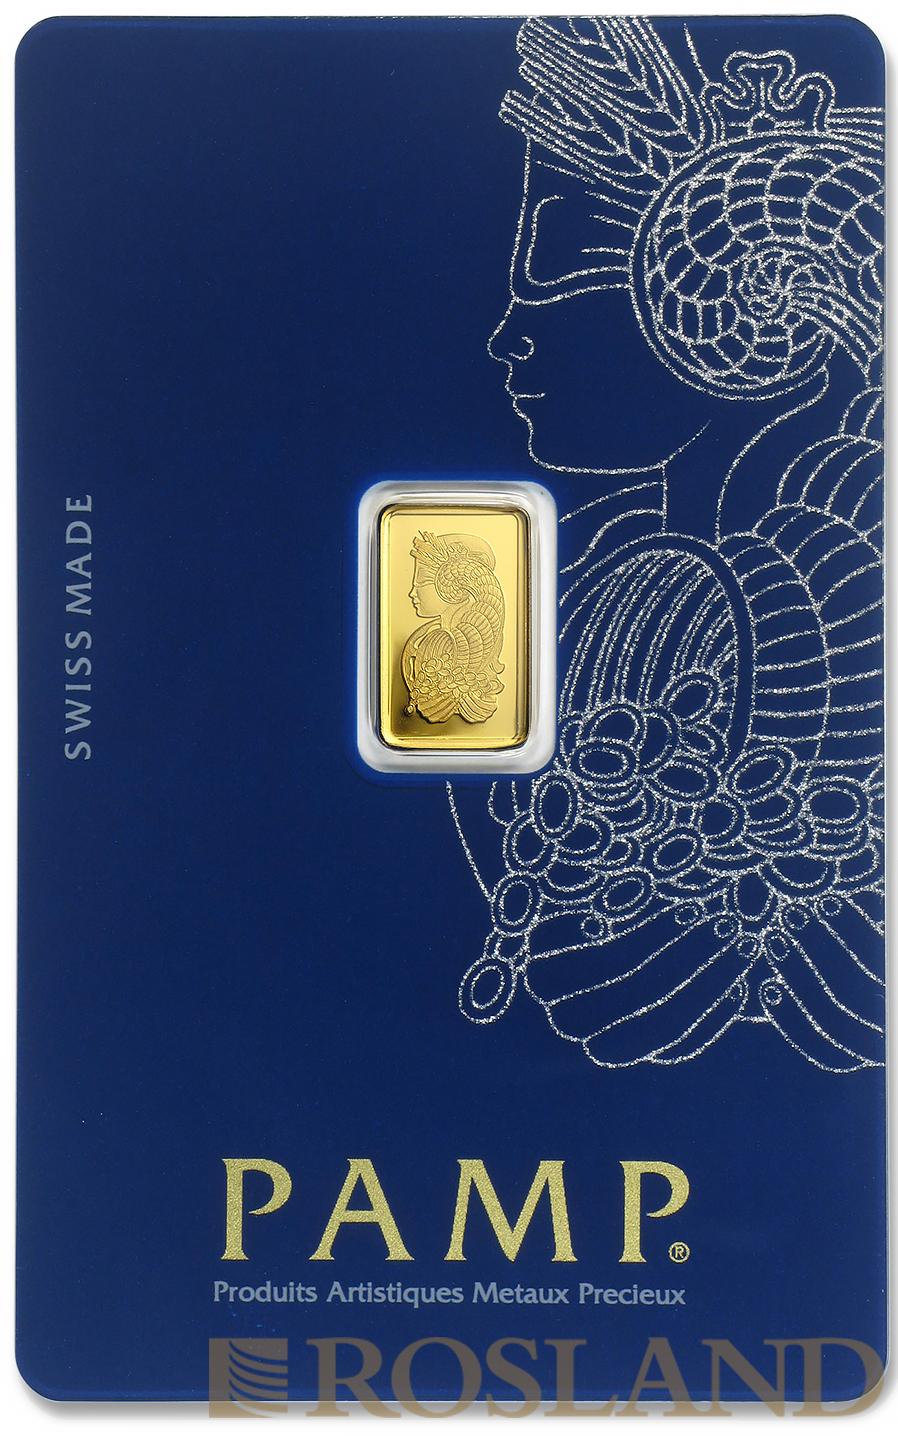 1 Gramm Goldbarren PAMP Lady Fortuna Veriscan®